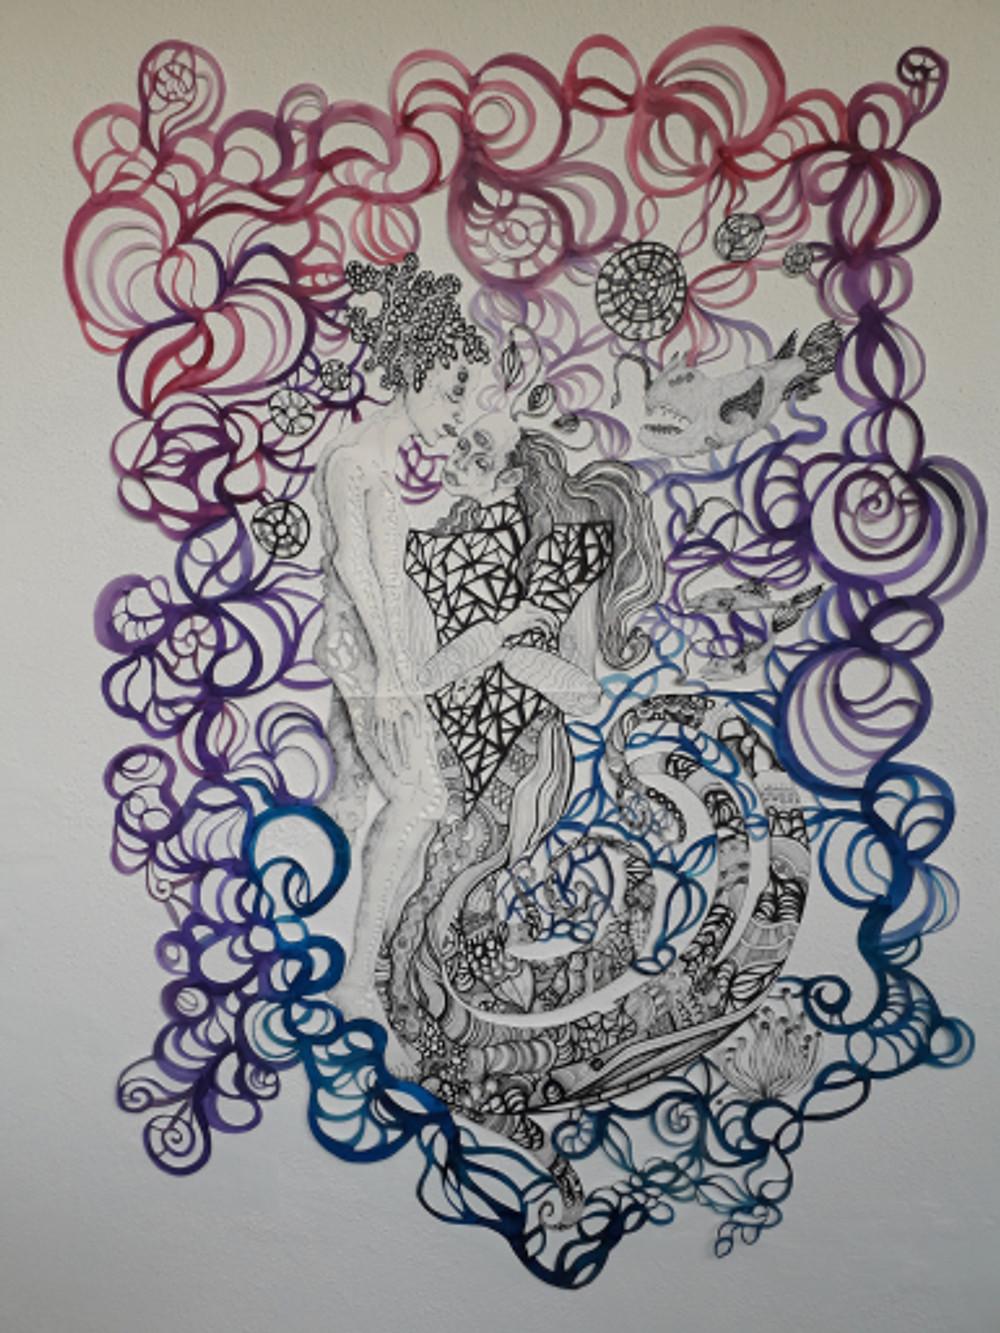 connections vol ii part iv, 150x70 cm, paper cut figure, inking pen, watercolor, 2018